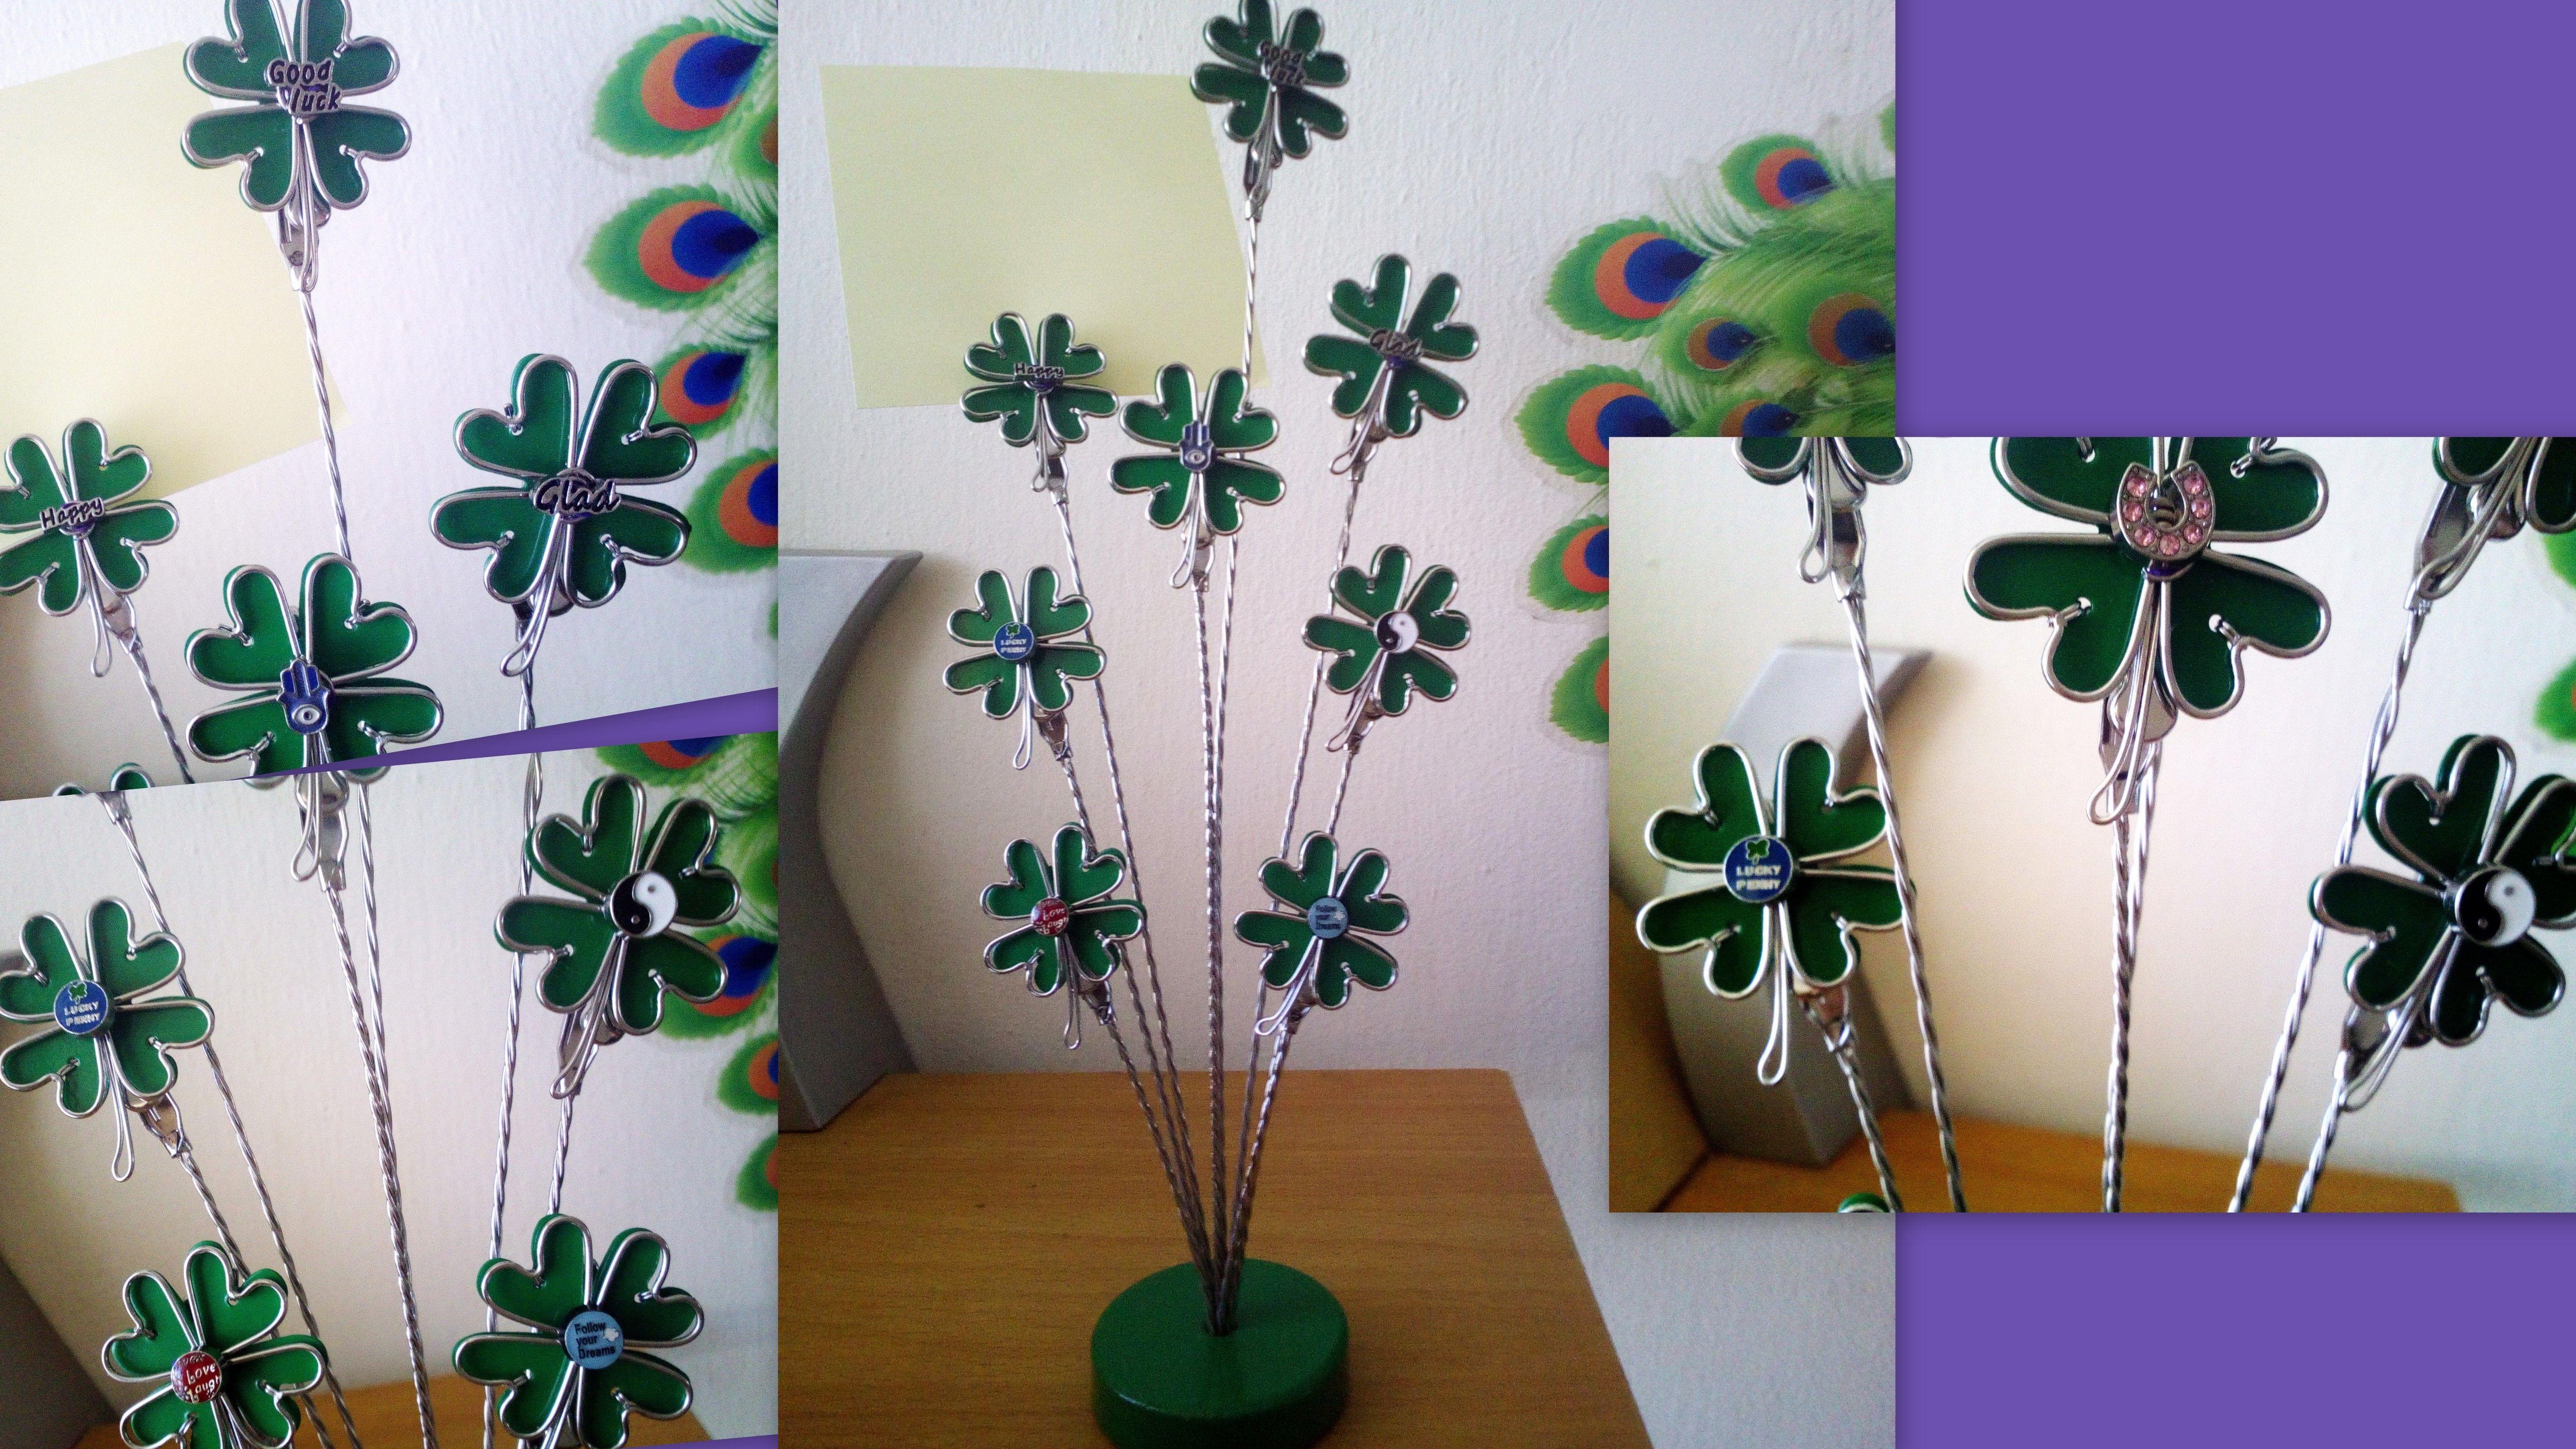 Positive Vibes 8 Clip Clover Lucky Penny Yin Yang Glad Happy Good Luck Hamsa/Horseshoe Dream Charm Memo Note Clip Birthday Home Office Decor